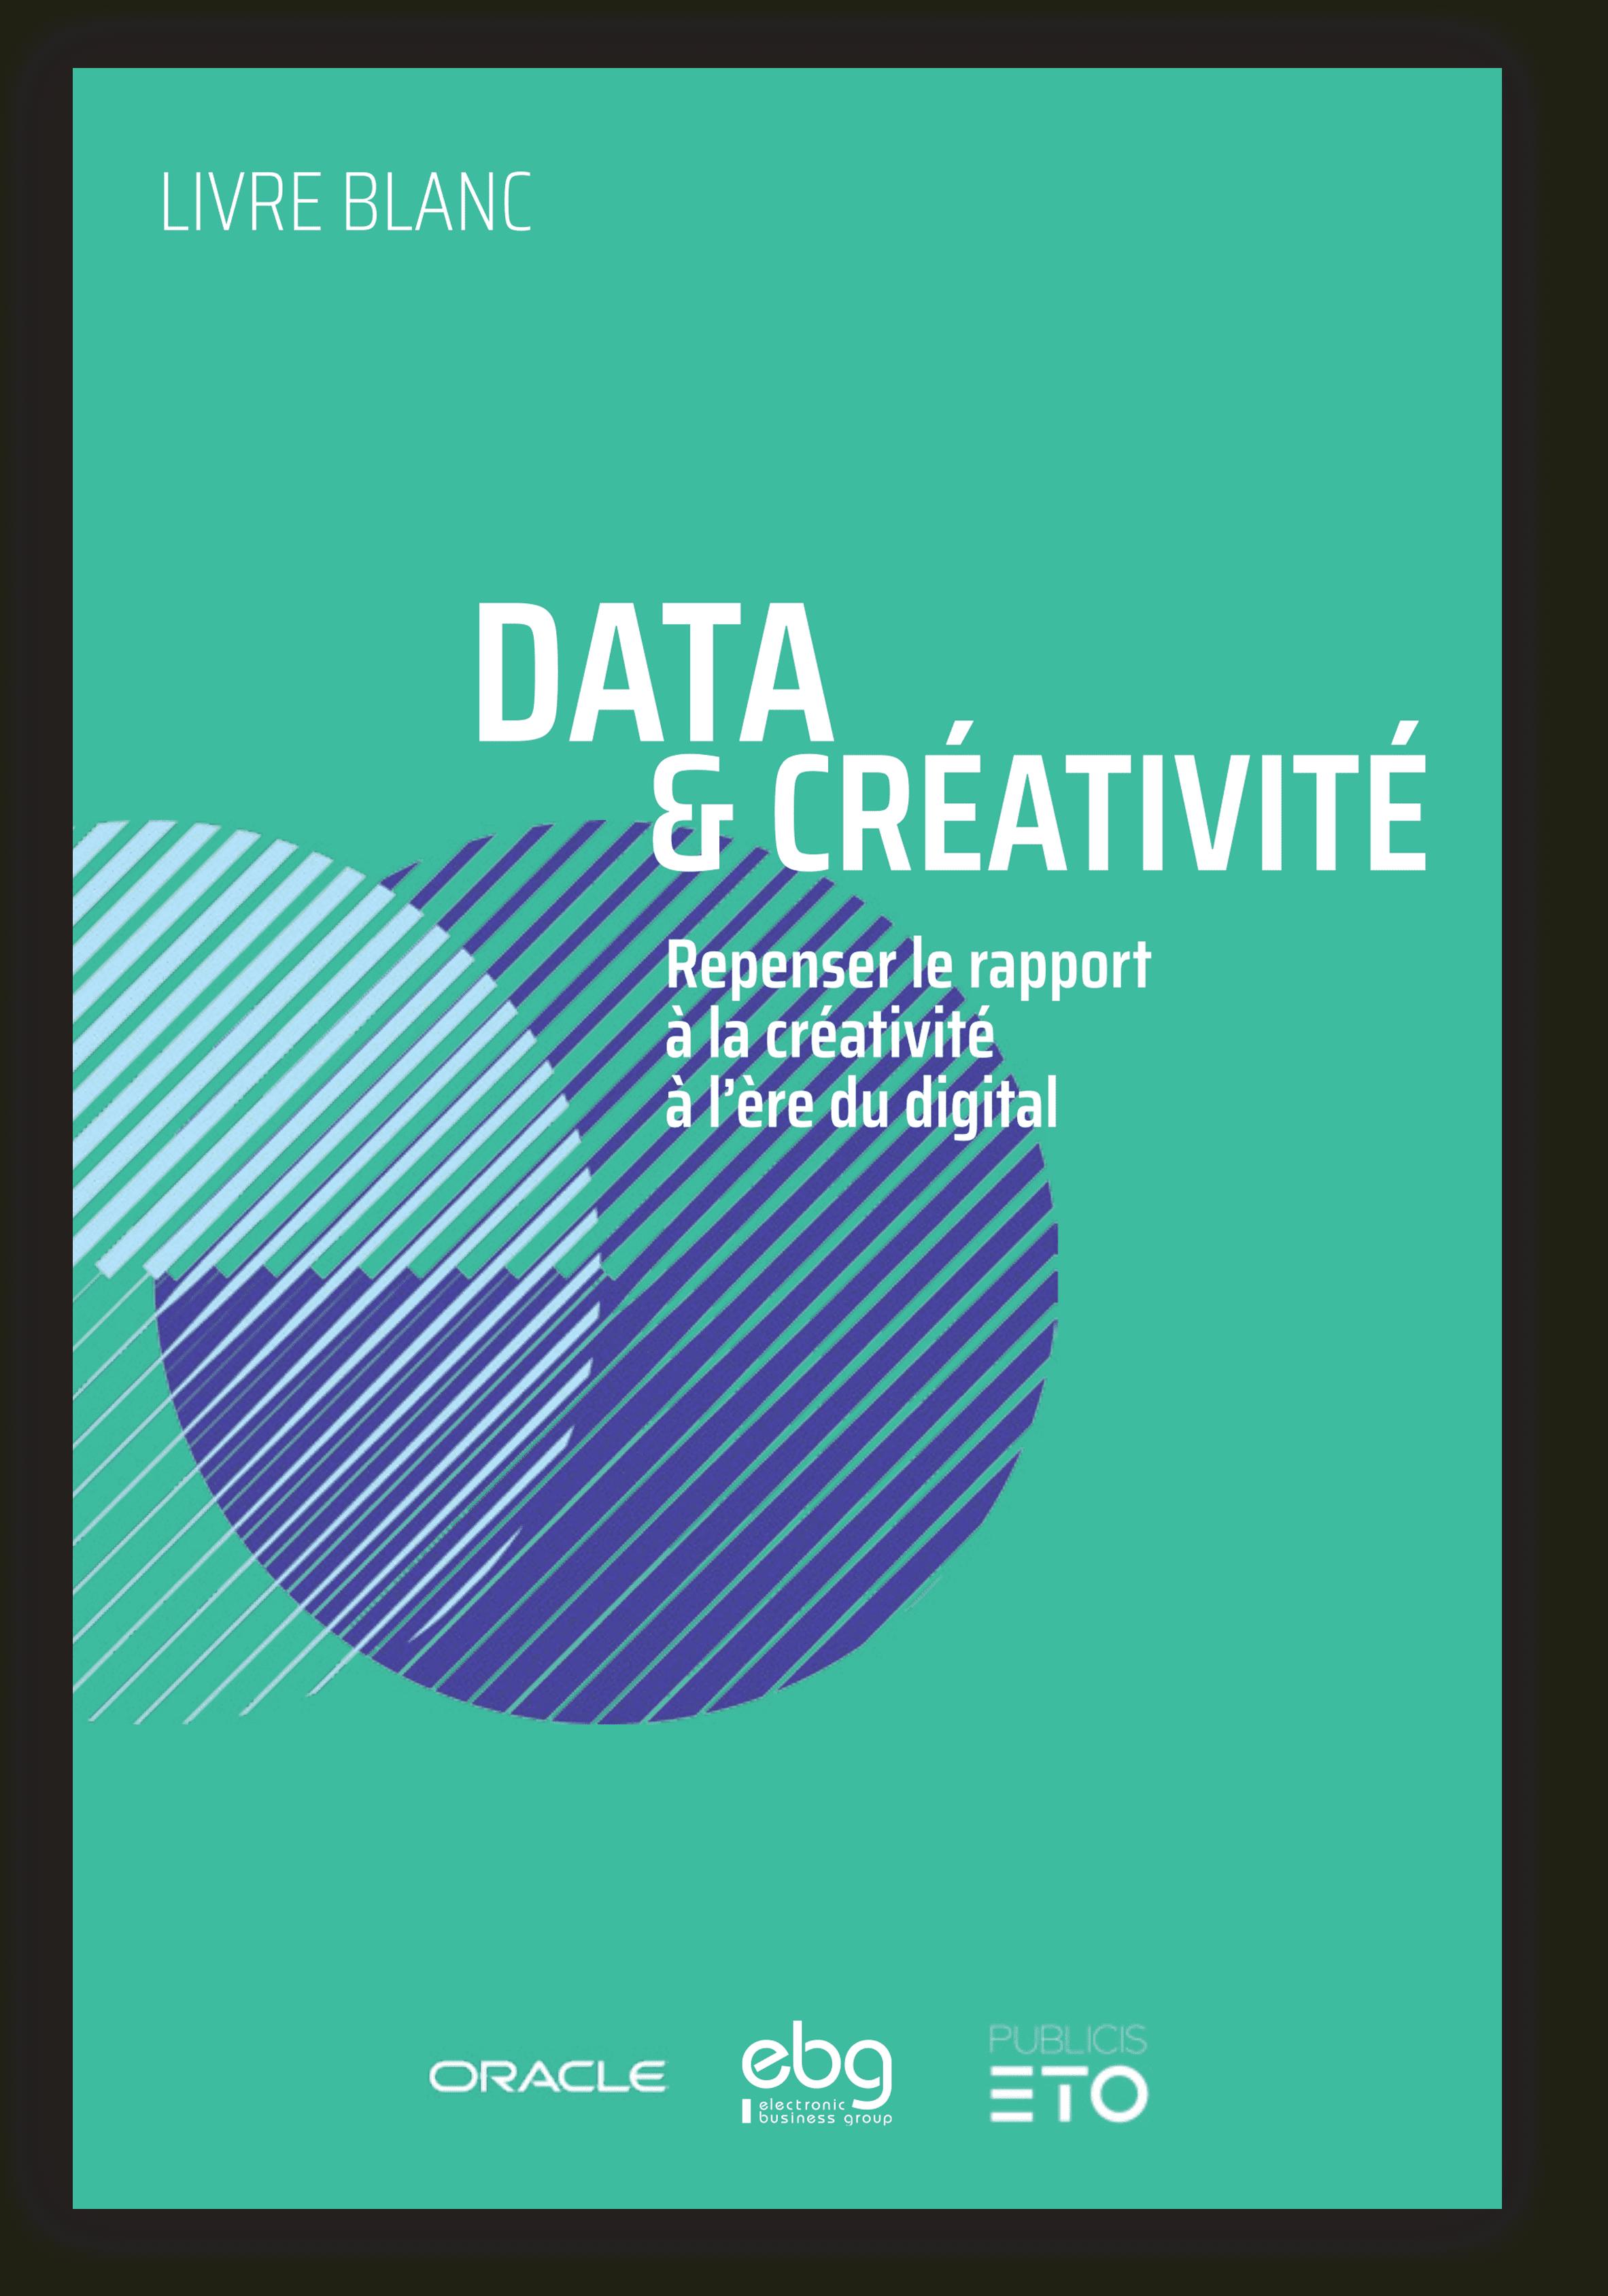 Livre_Blanc_Data&Creativite-1.png